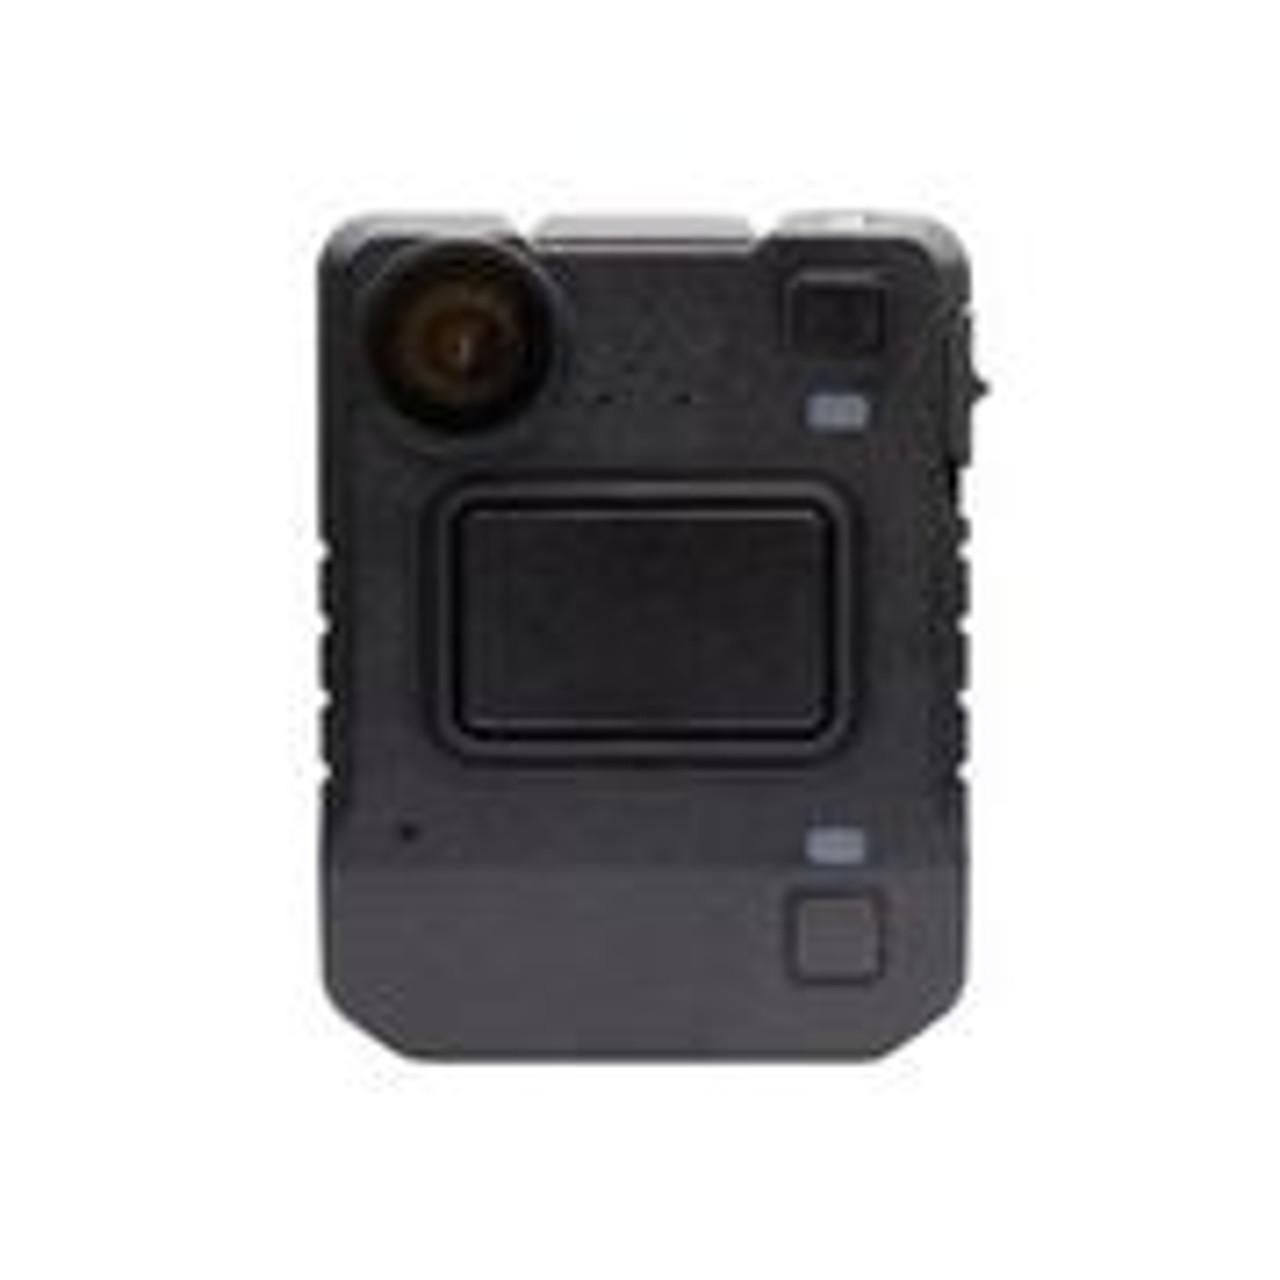 Motorola Solutions VB400 Body Camera